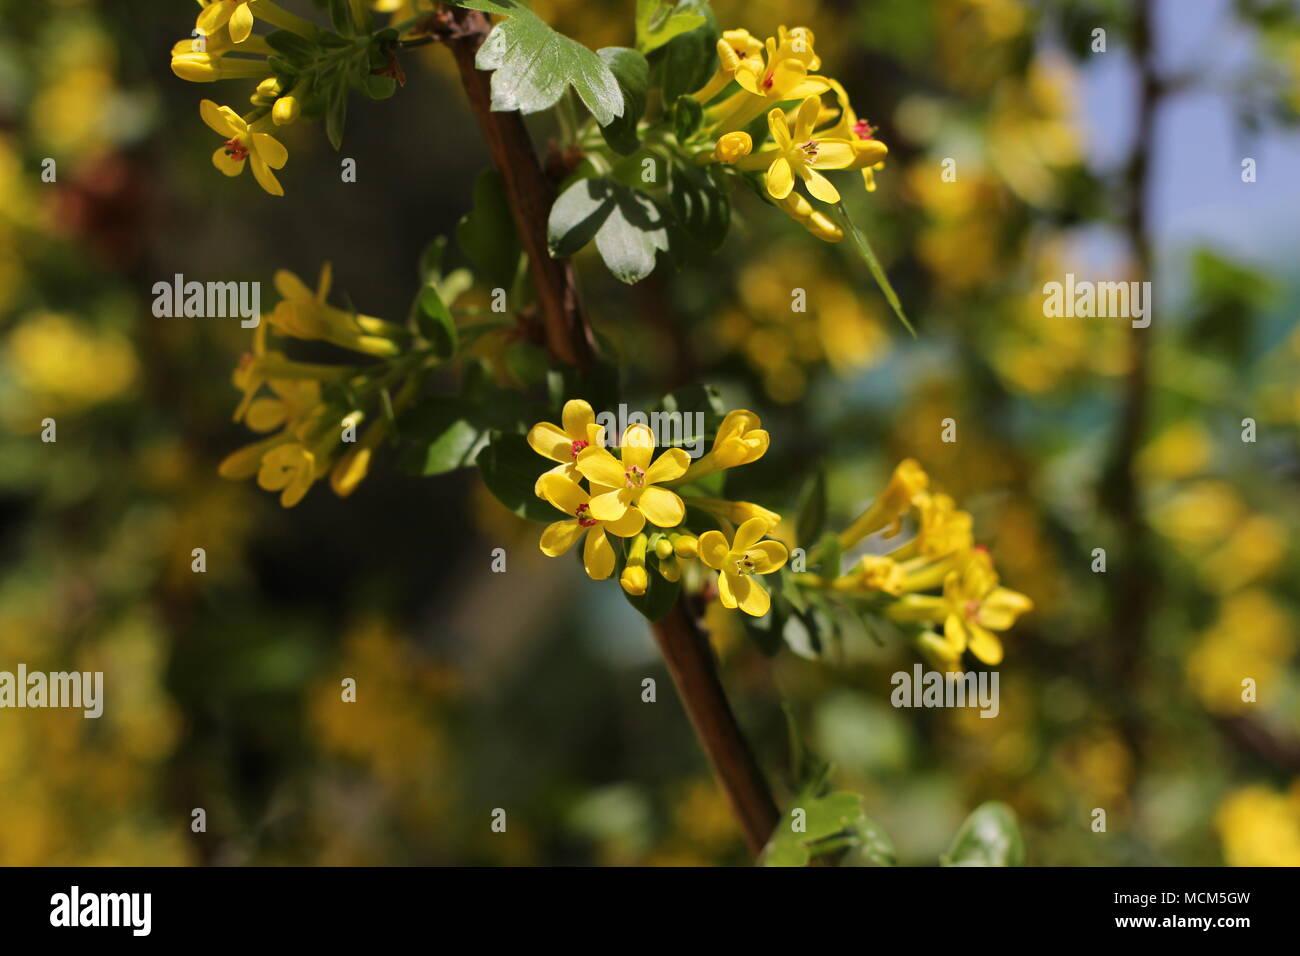 Yellow flowers of golden currant ribes aureum stock photo yellow flowers of golden currant ribes aureum mightylinksfo